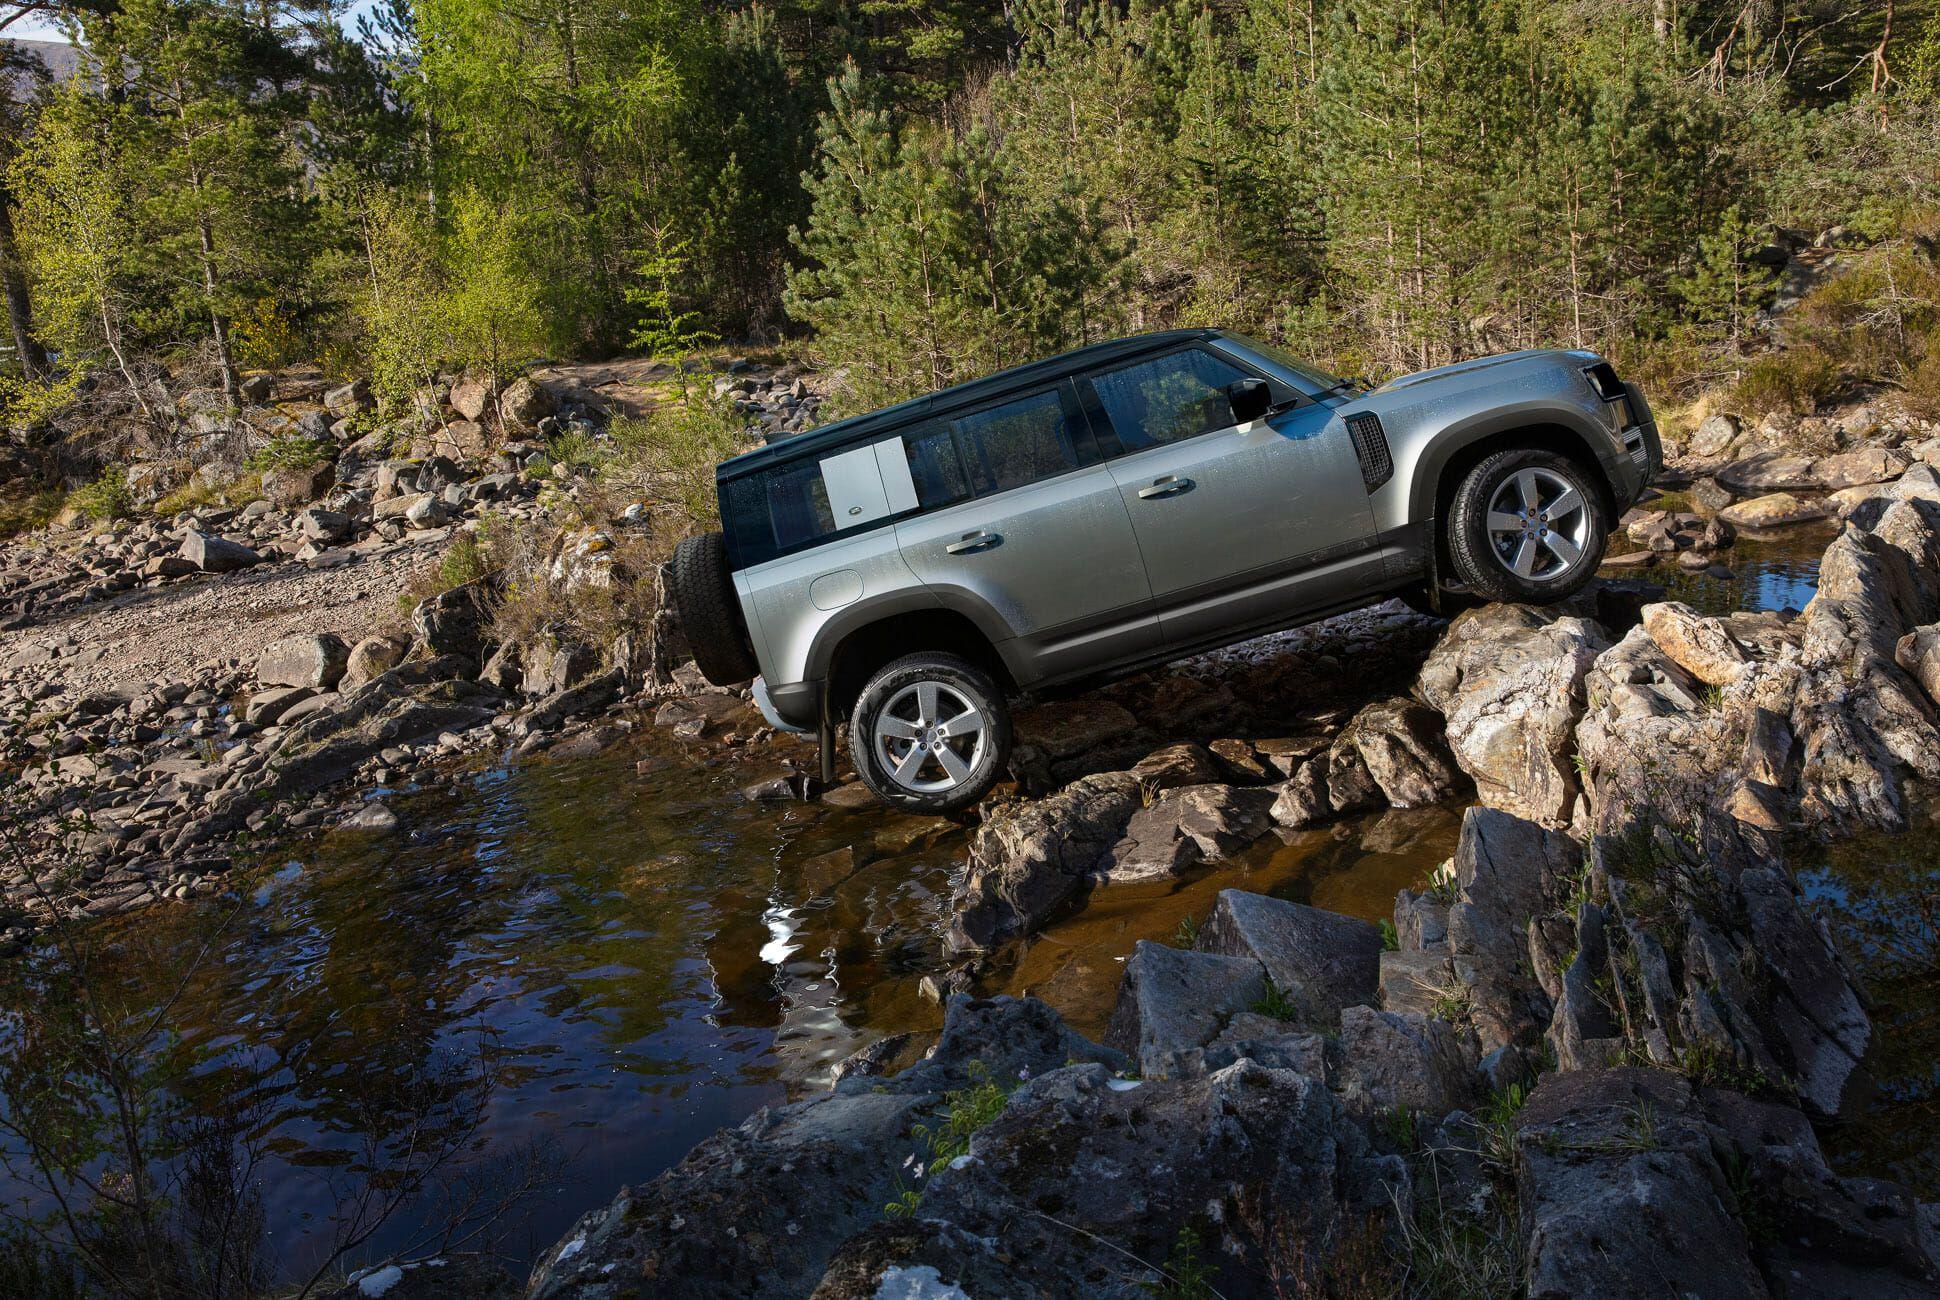 Land Rover Defender Gear Patrol-Exterior Action-Slide-25